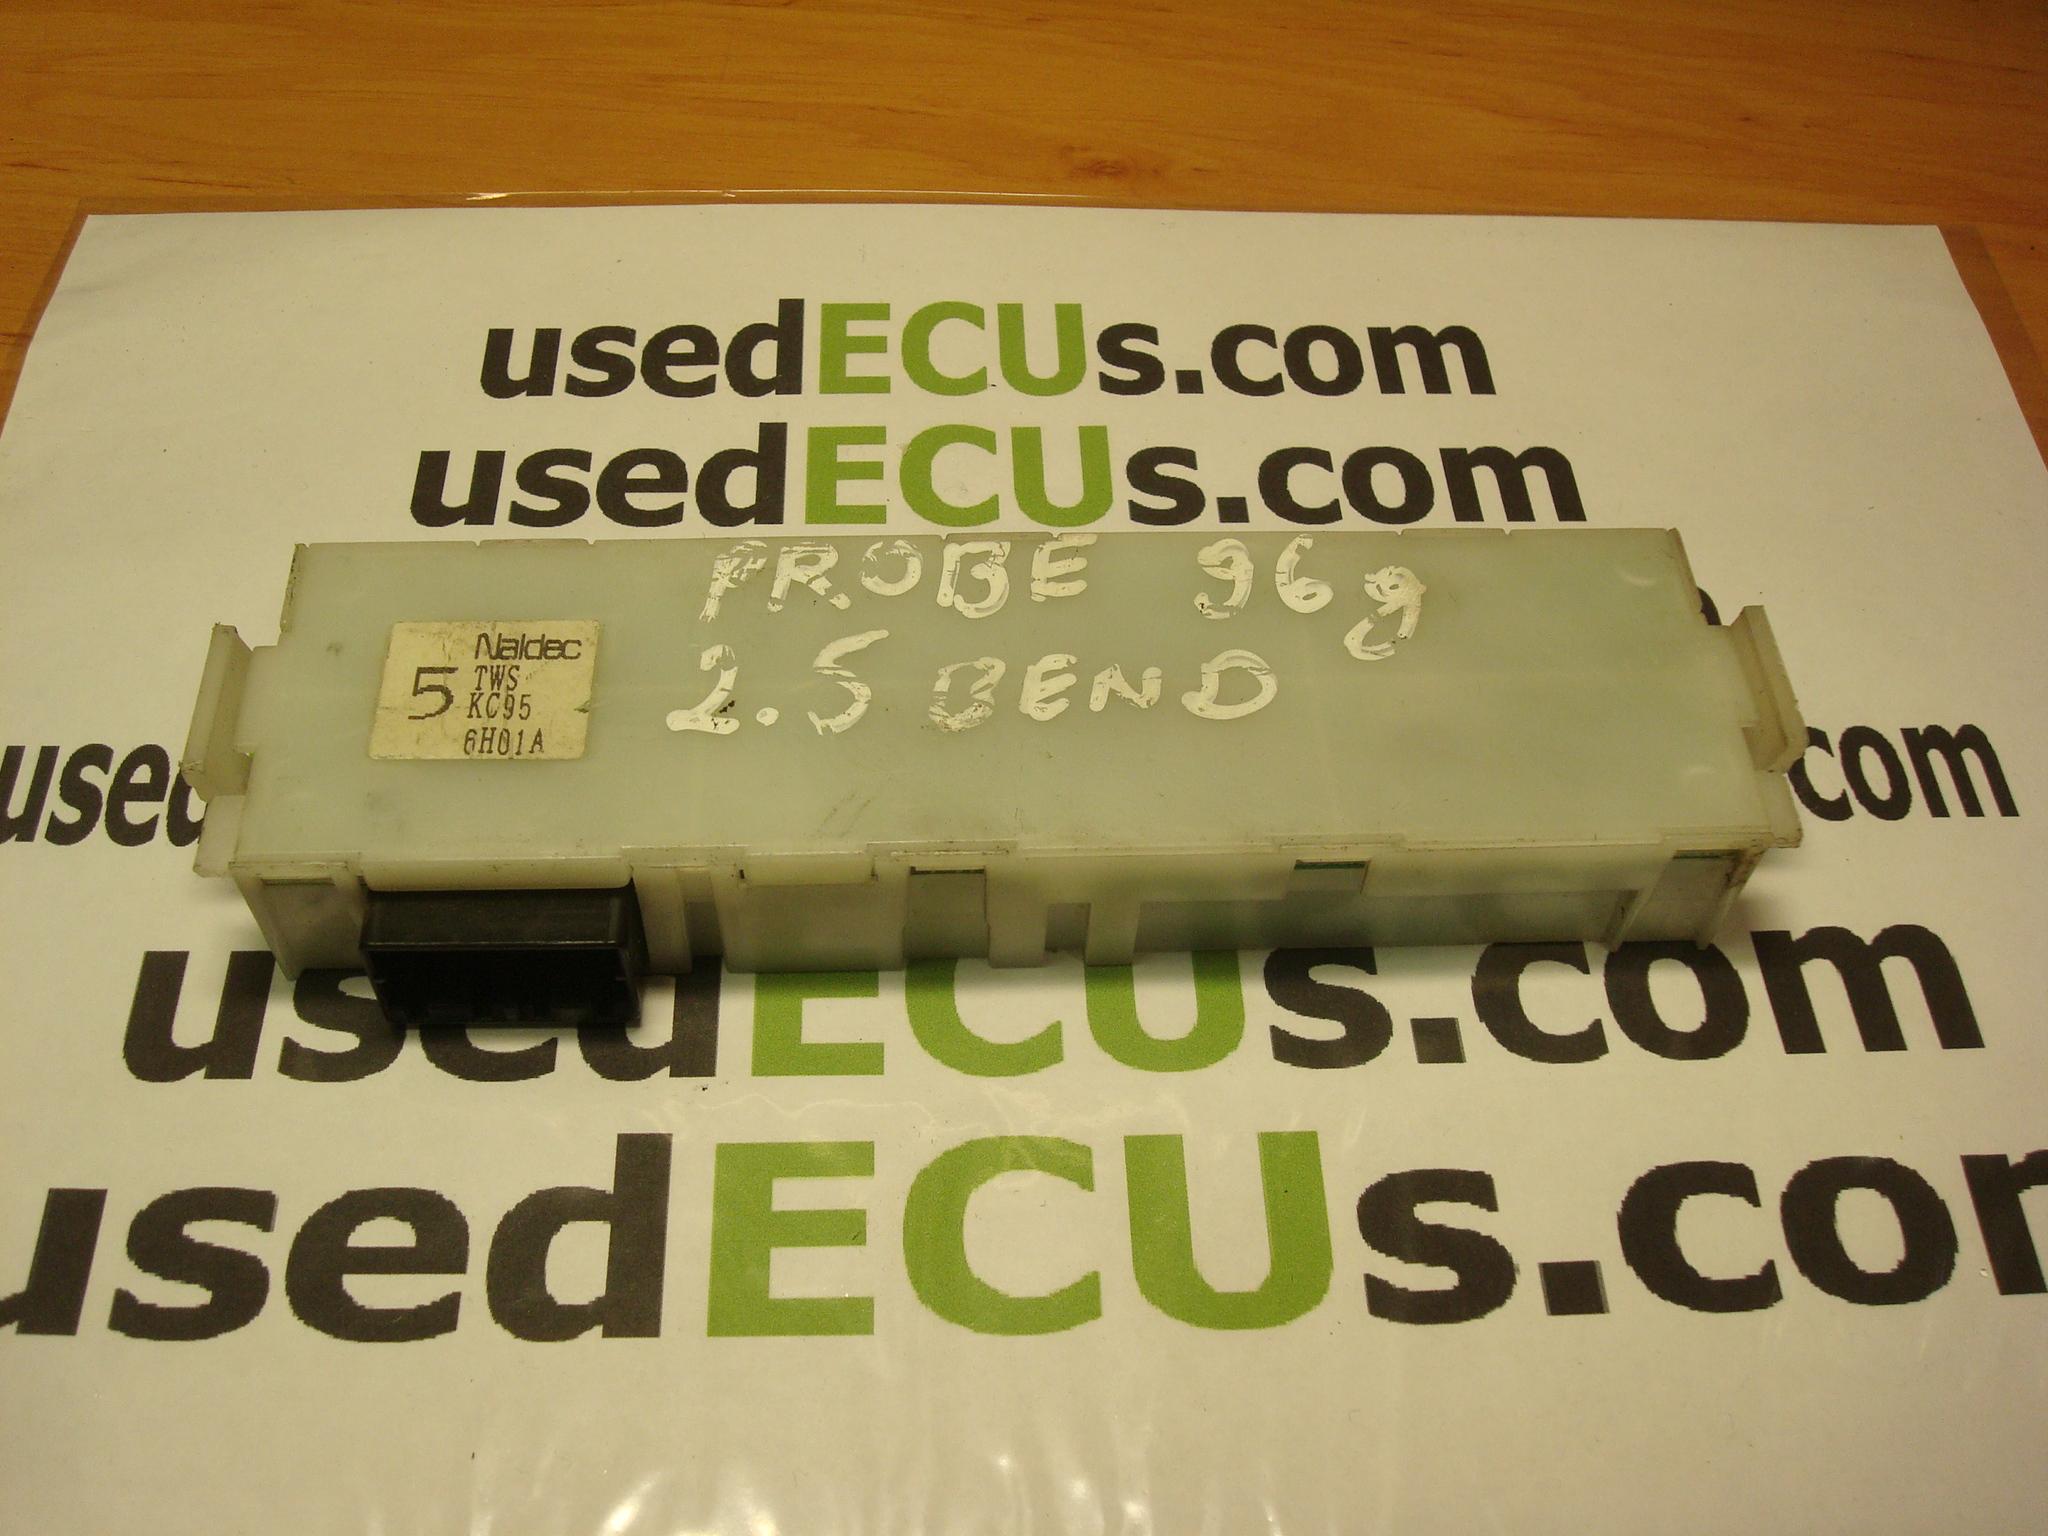 Ford Probe, 95, 2,5 Petrol, Fuse Box Ecu, Naldec, 5 TWS KC95 6H01A  (Article: 5 TWS KC95 6H01A)